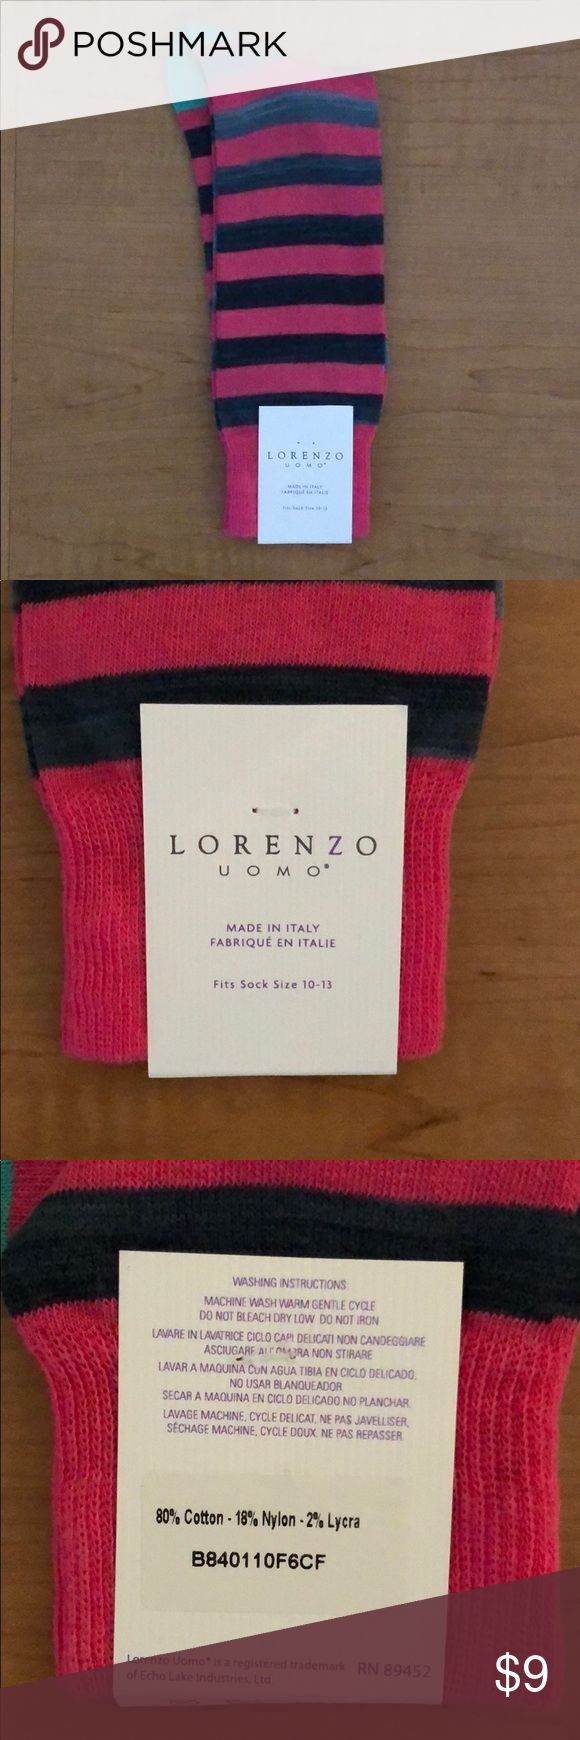 NWT Lorenzo Uomo Italian Men's Fashion Socks Cotton socks - Made in Italy Lorenzo Uomo Underwear & Socks Dress Socks